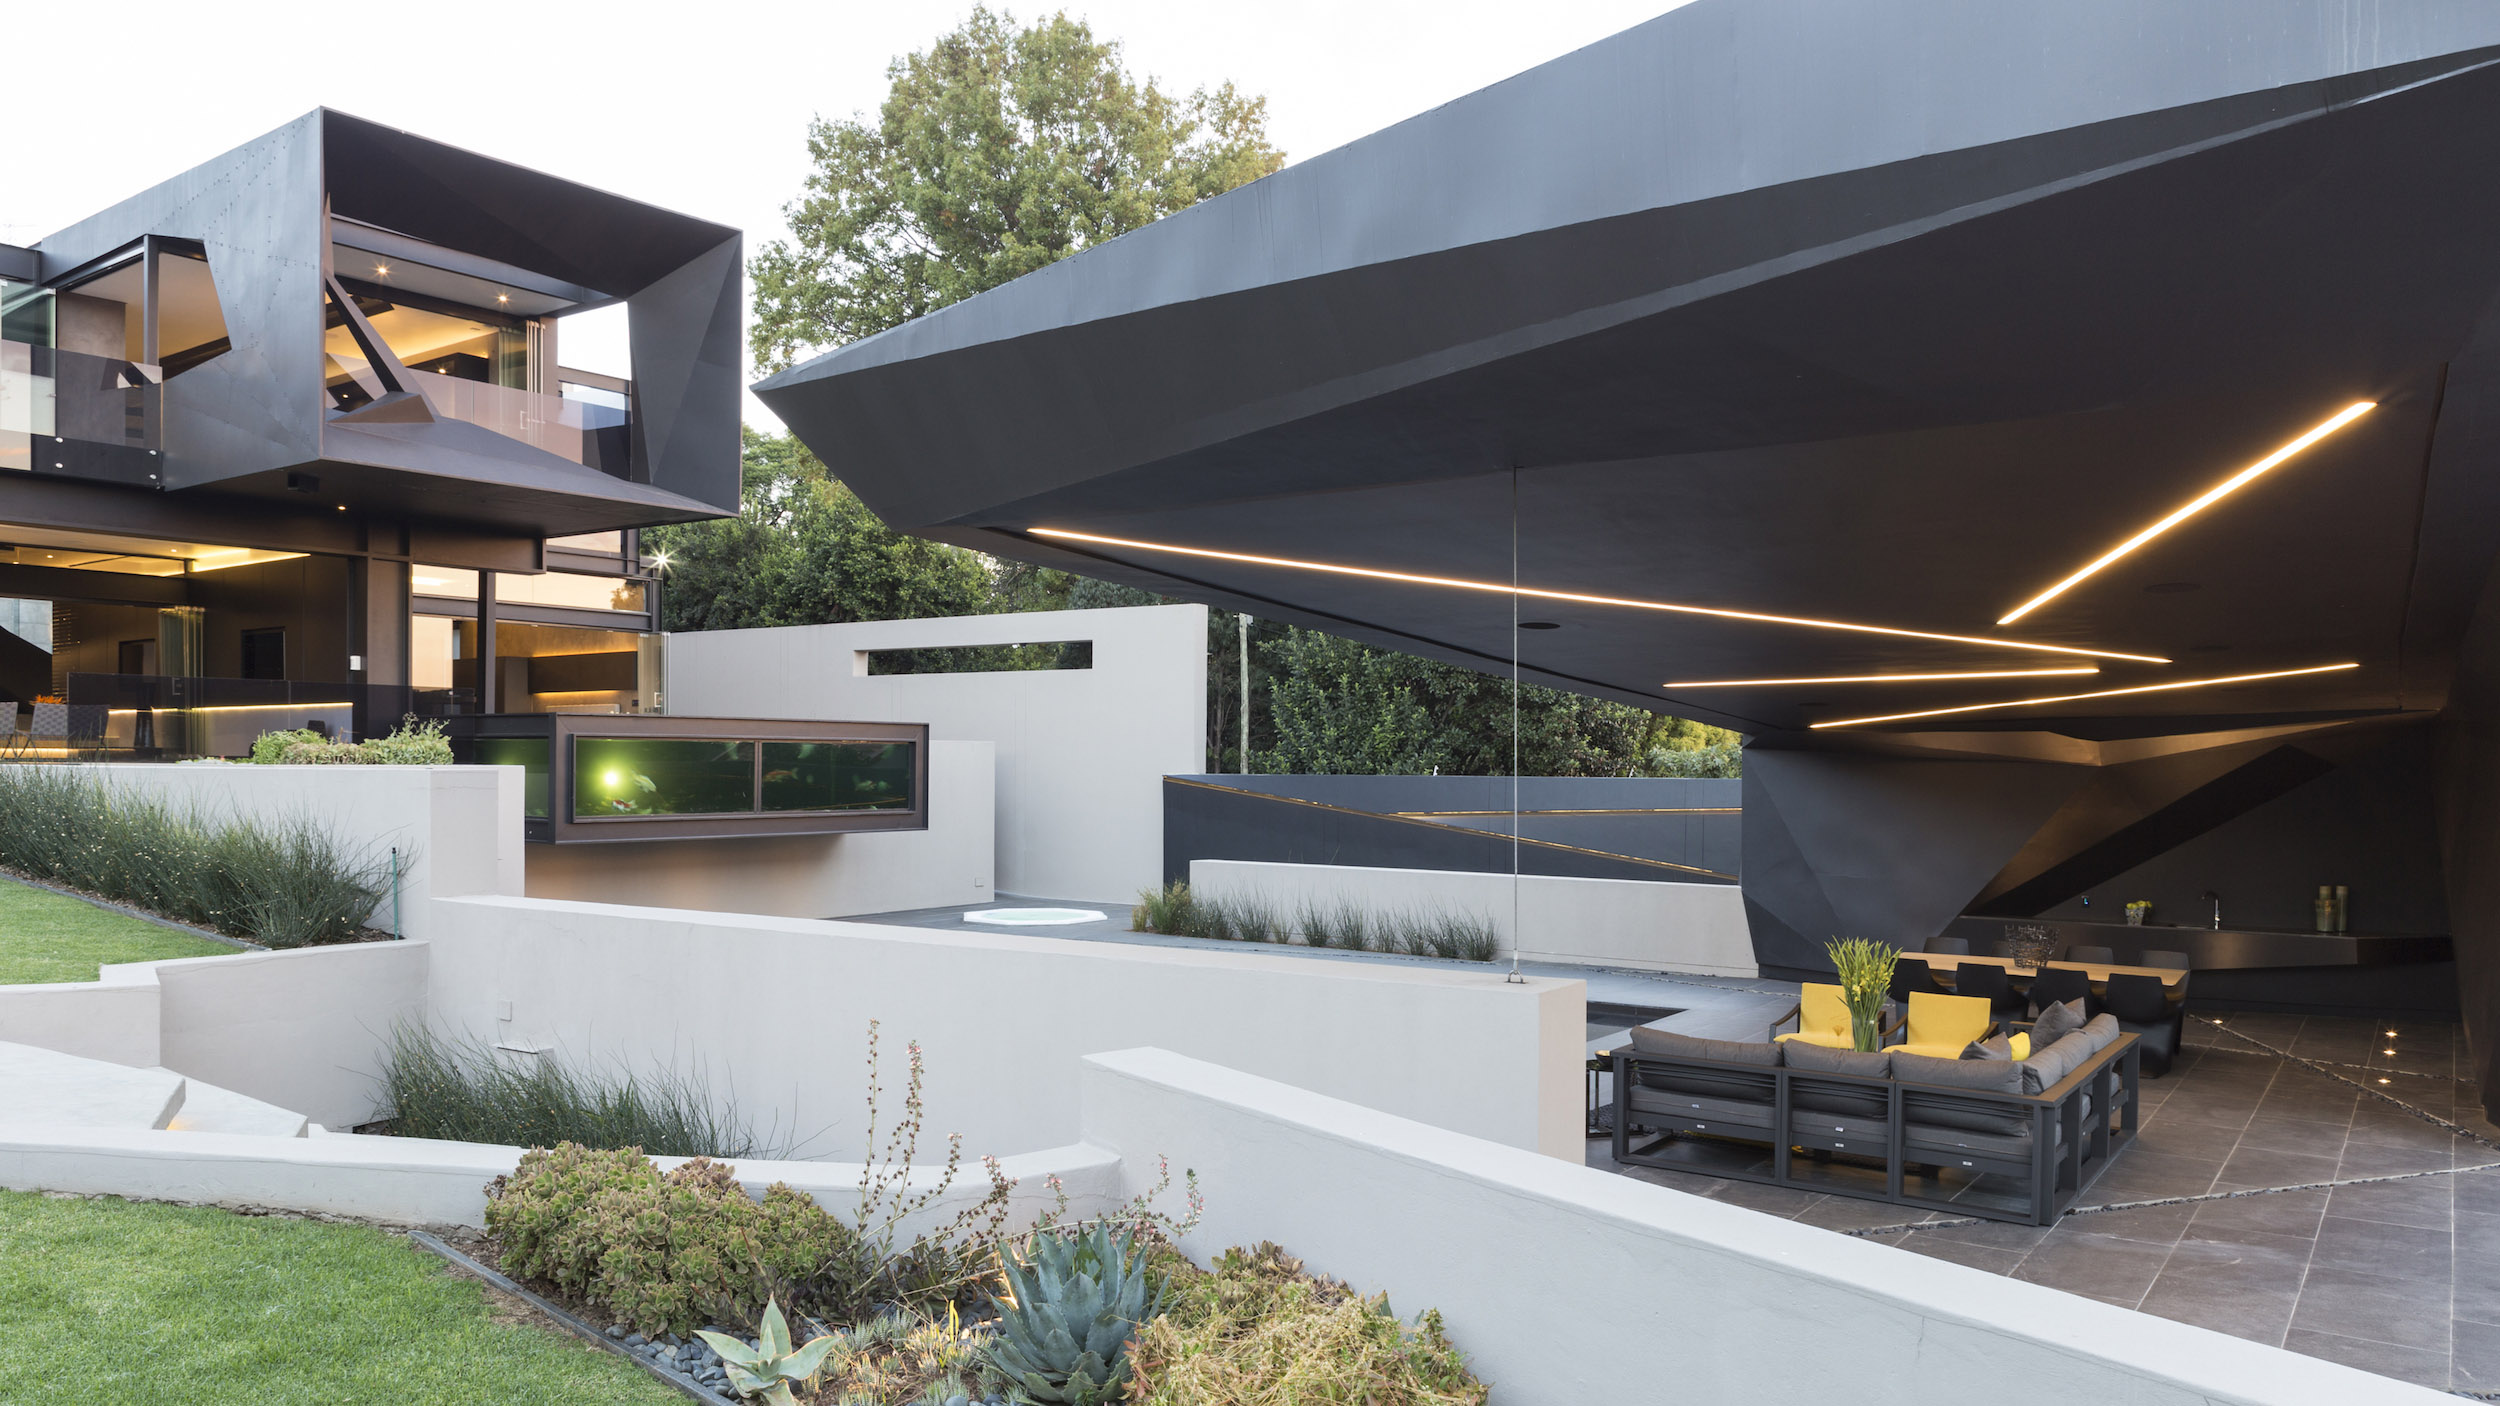 Kloof Road Masterpiece House in Johannesburg by Nico van der Meulen Architects-11